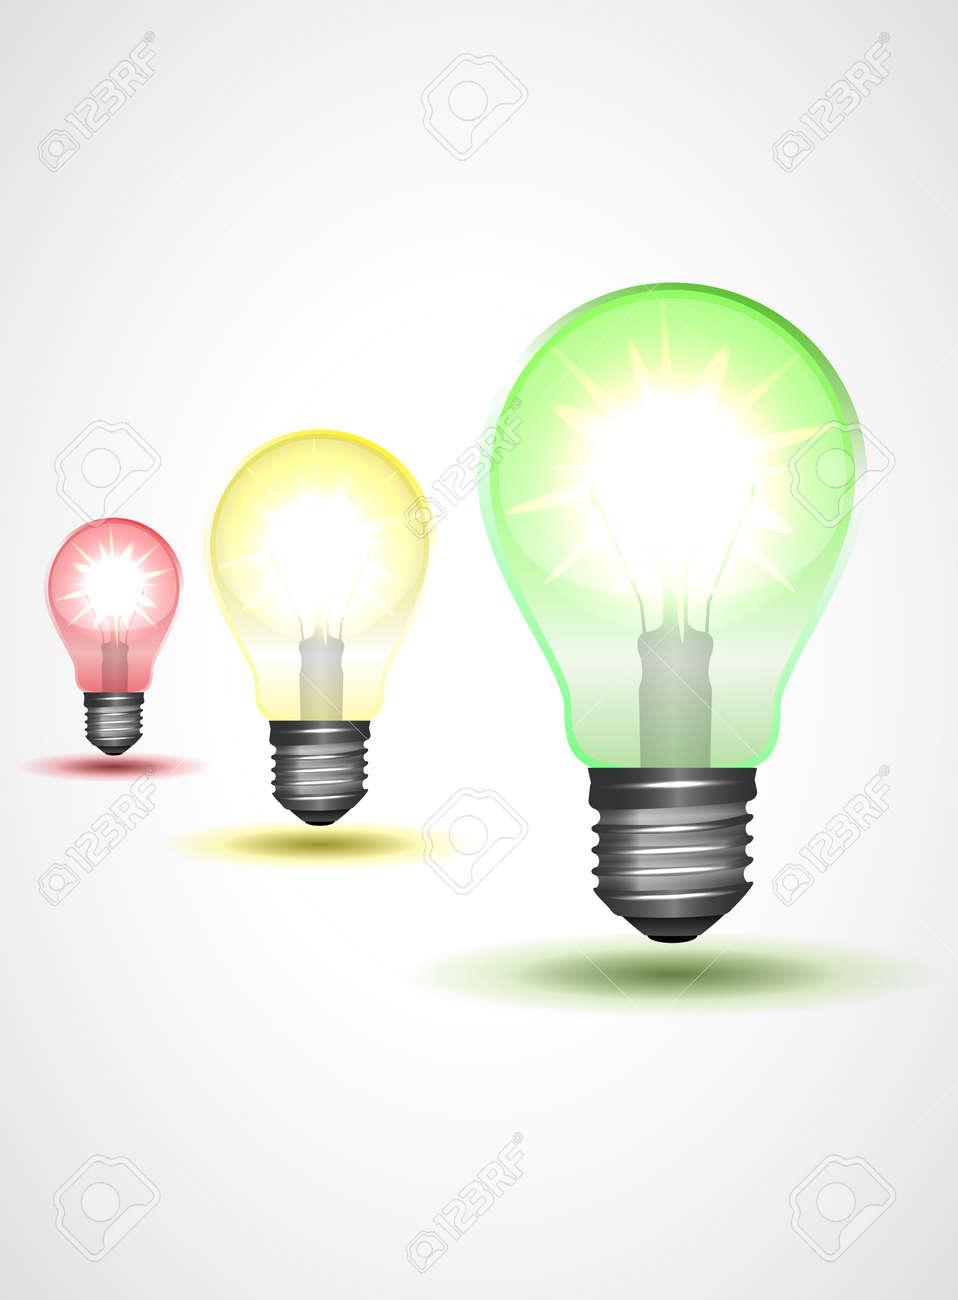 Traffic light or varicolored lamp set illustration Stock Vector - 12498475